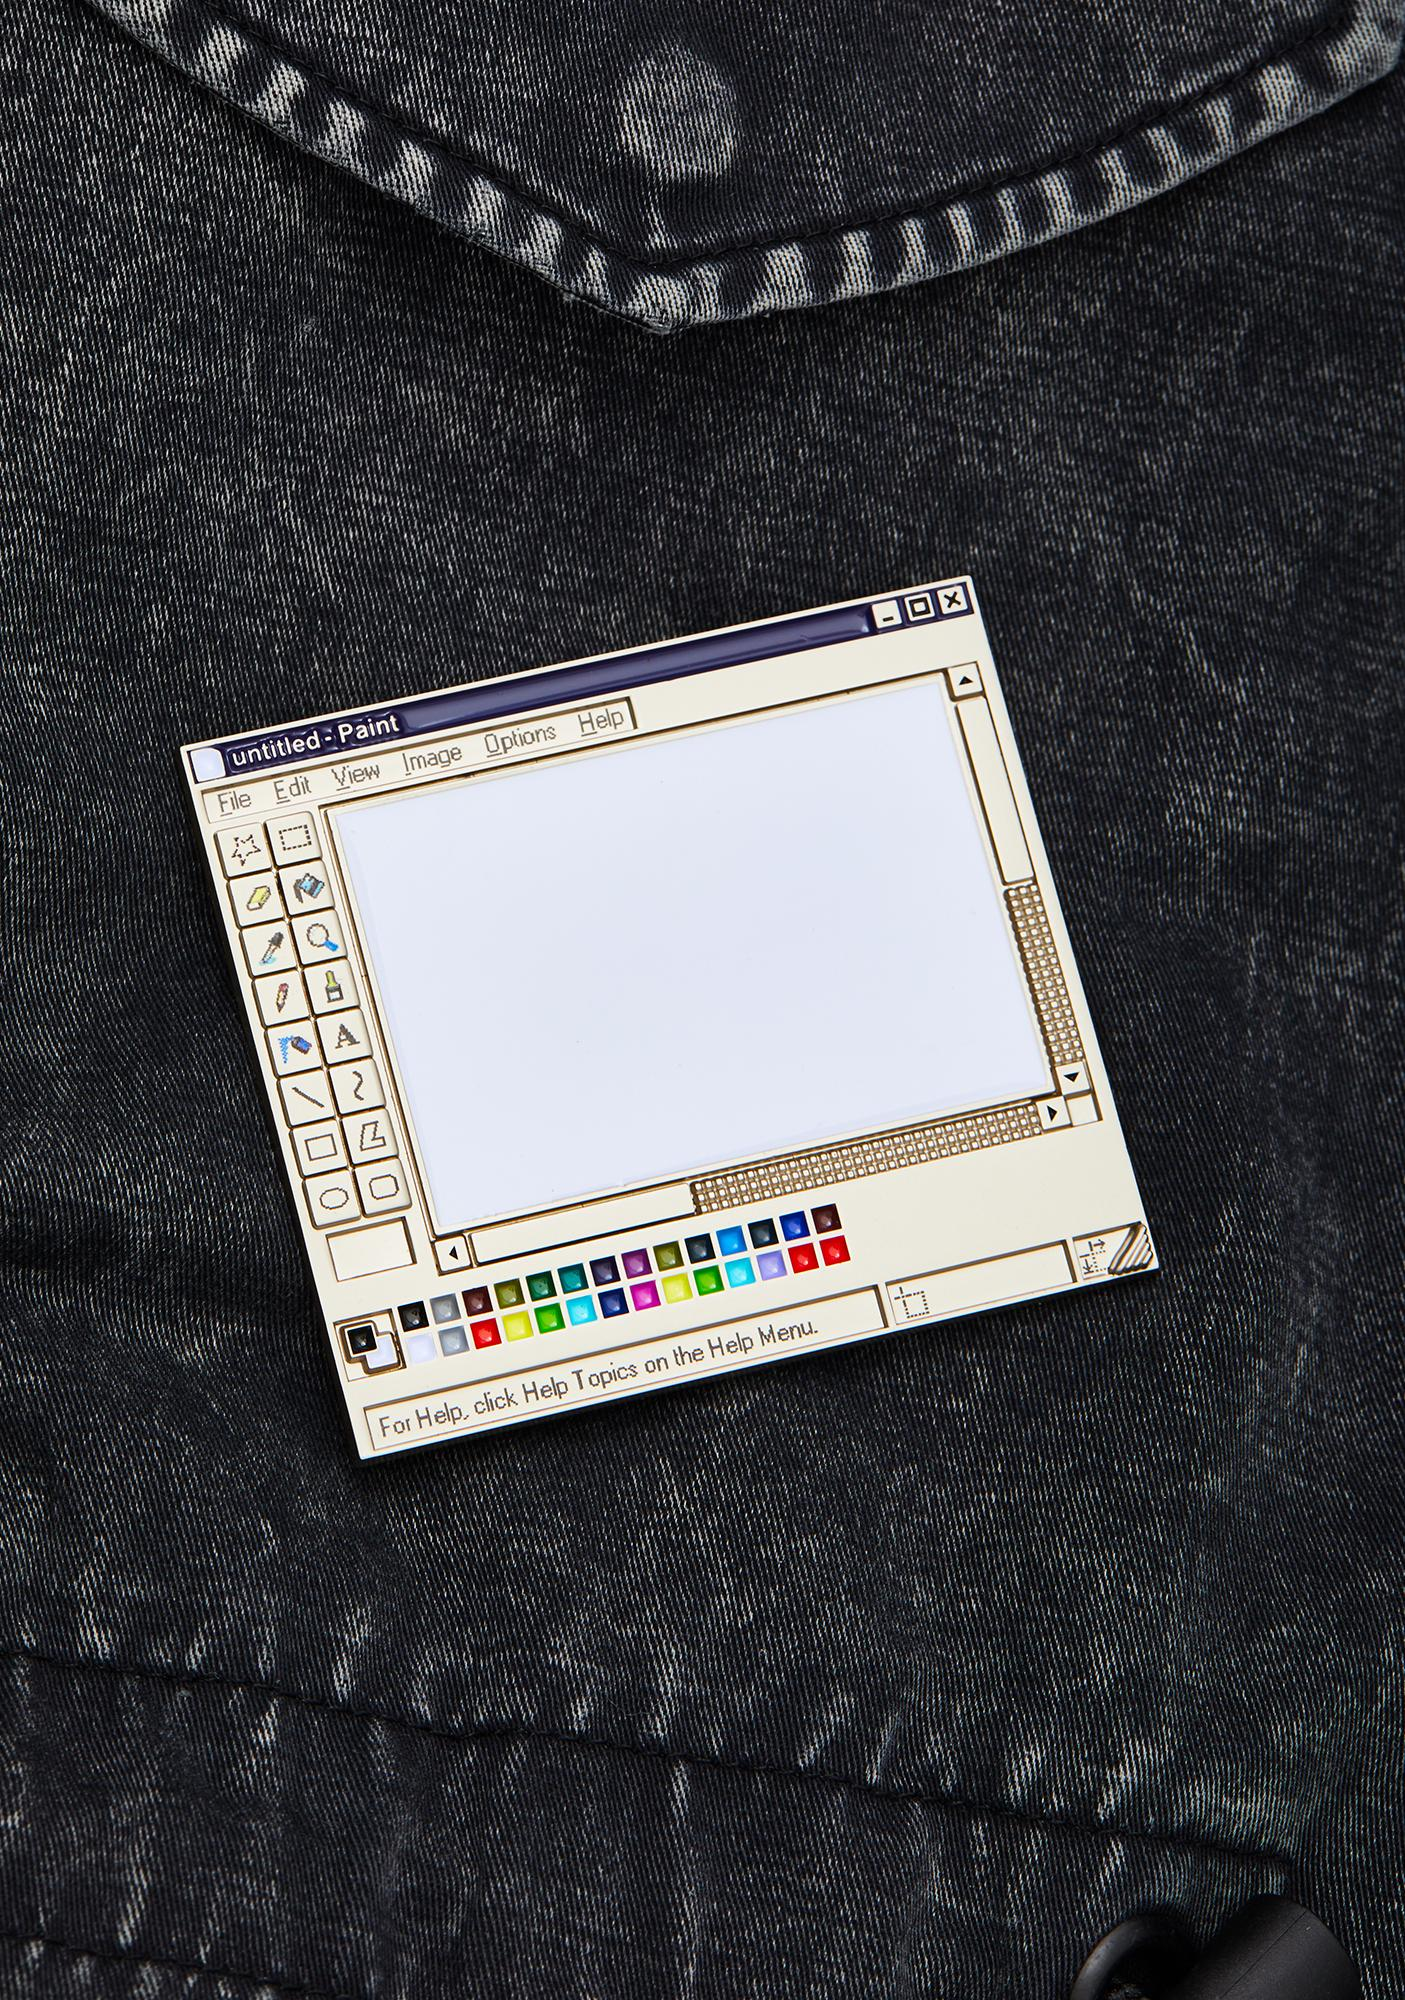 Studio Cult MS Paint Enamel Pin